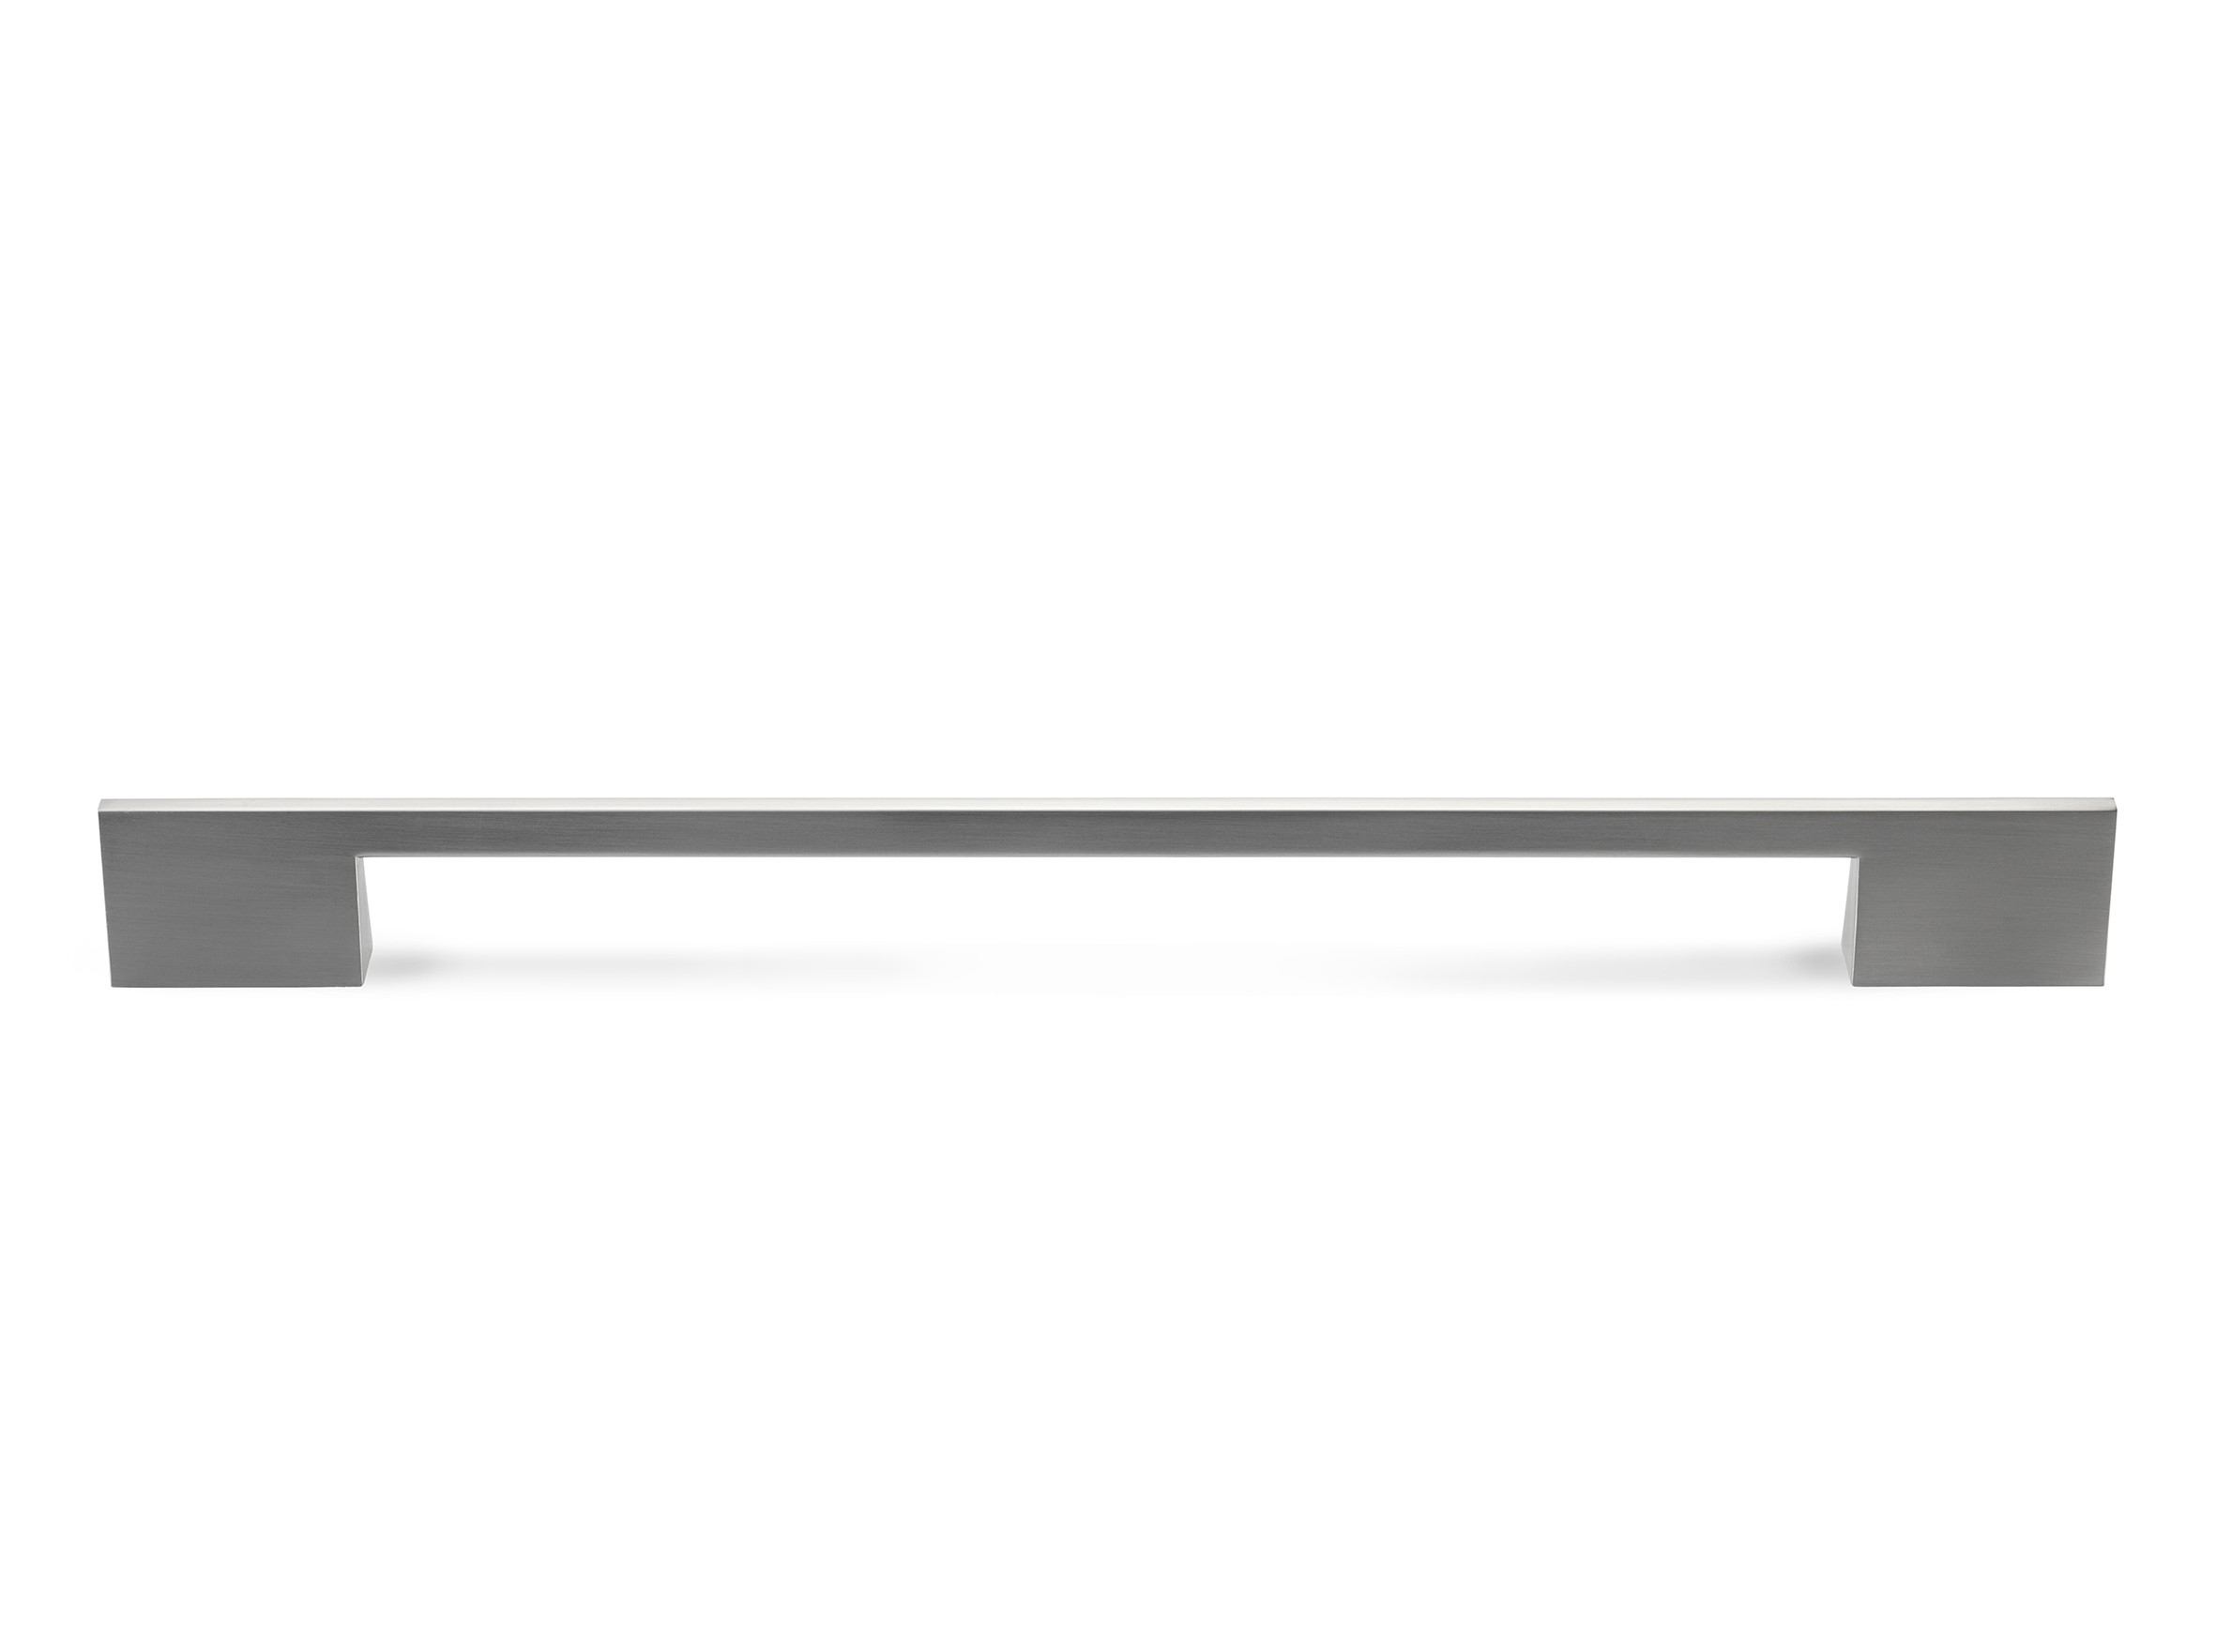 Ballingslöv Handtag HG455 Borstad metall c/c 320 mm